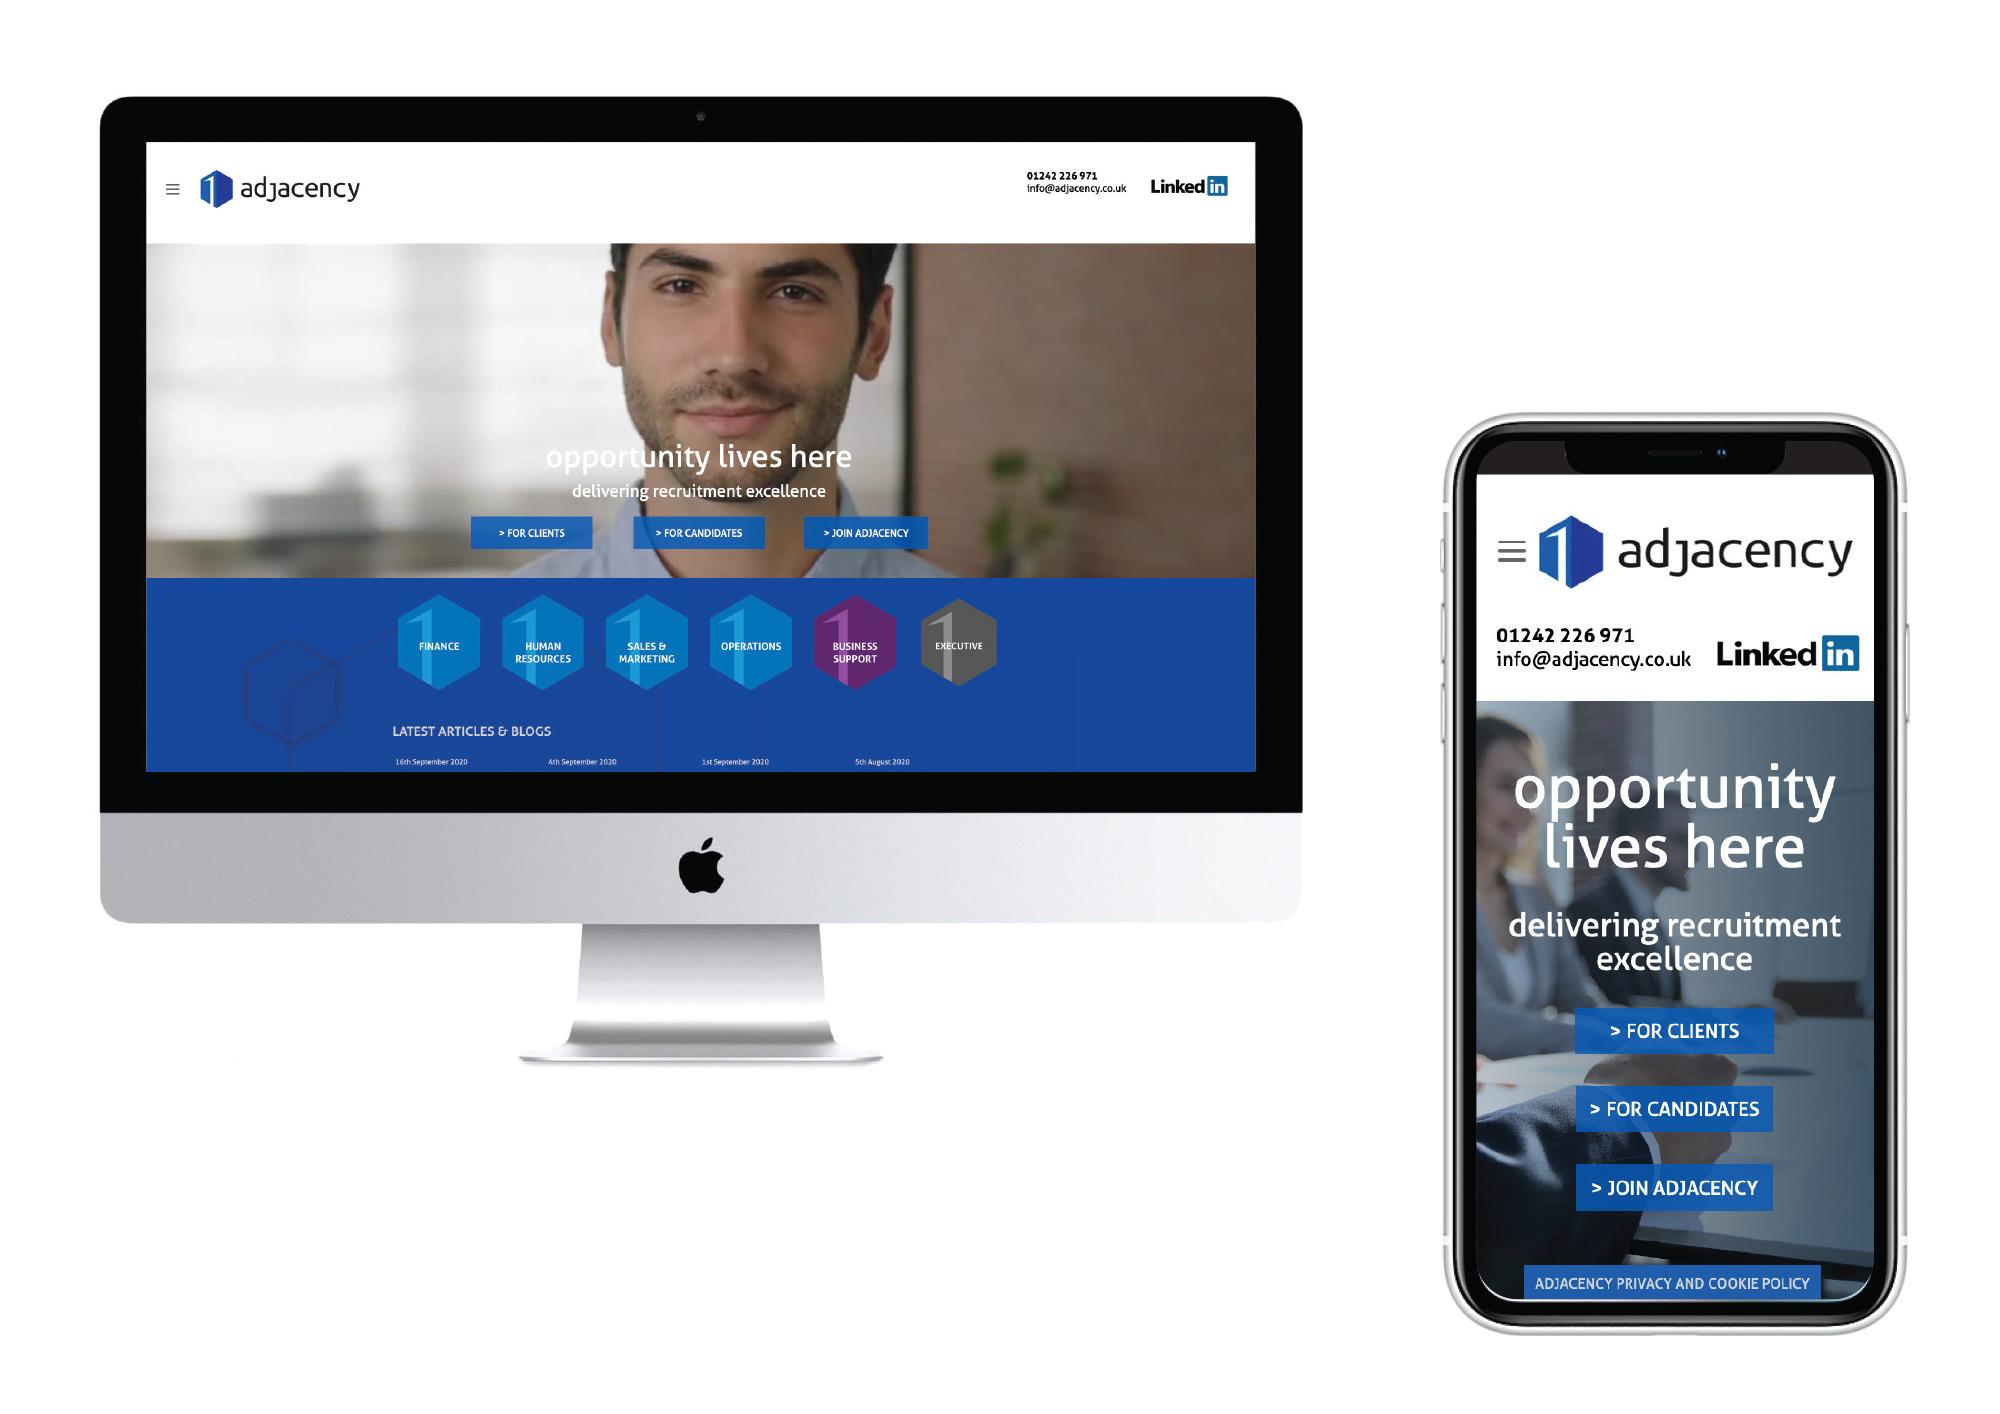 adjacency-website